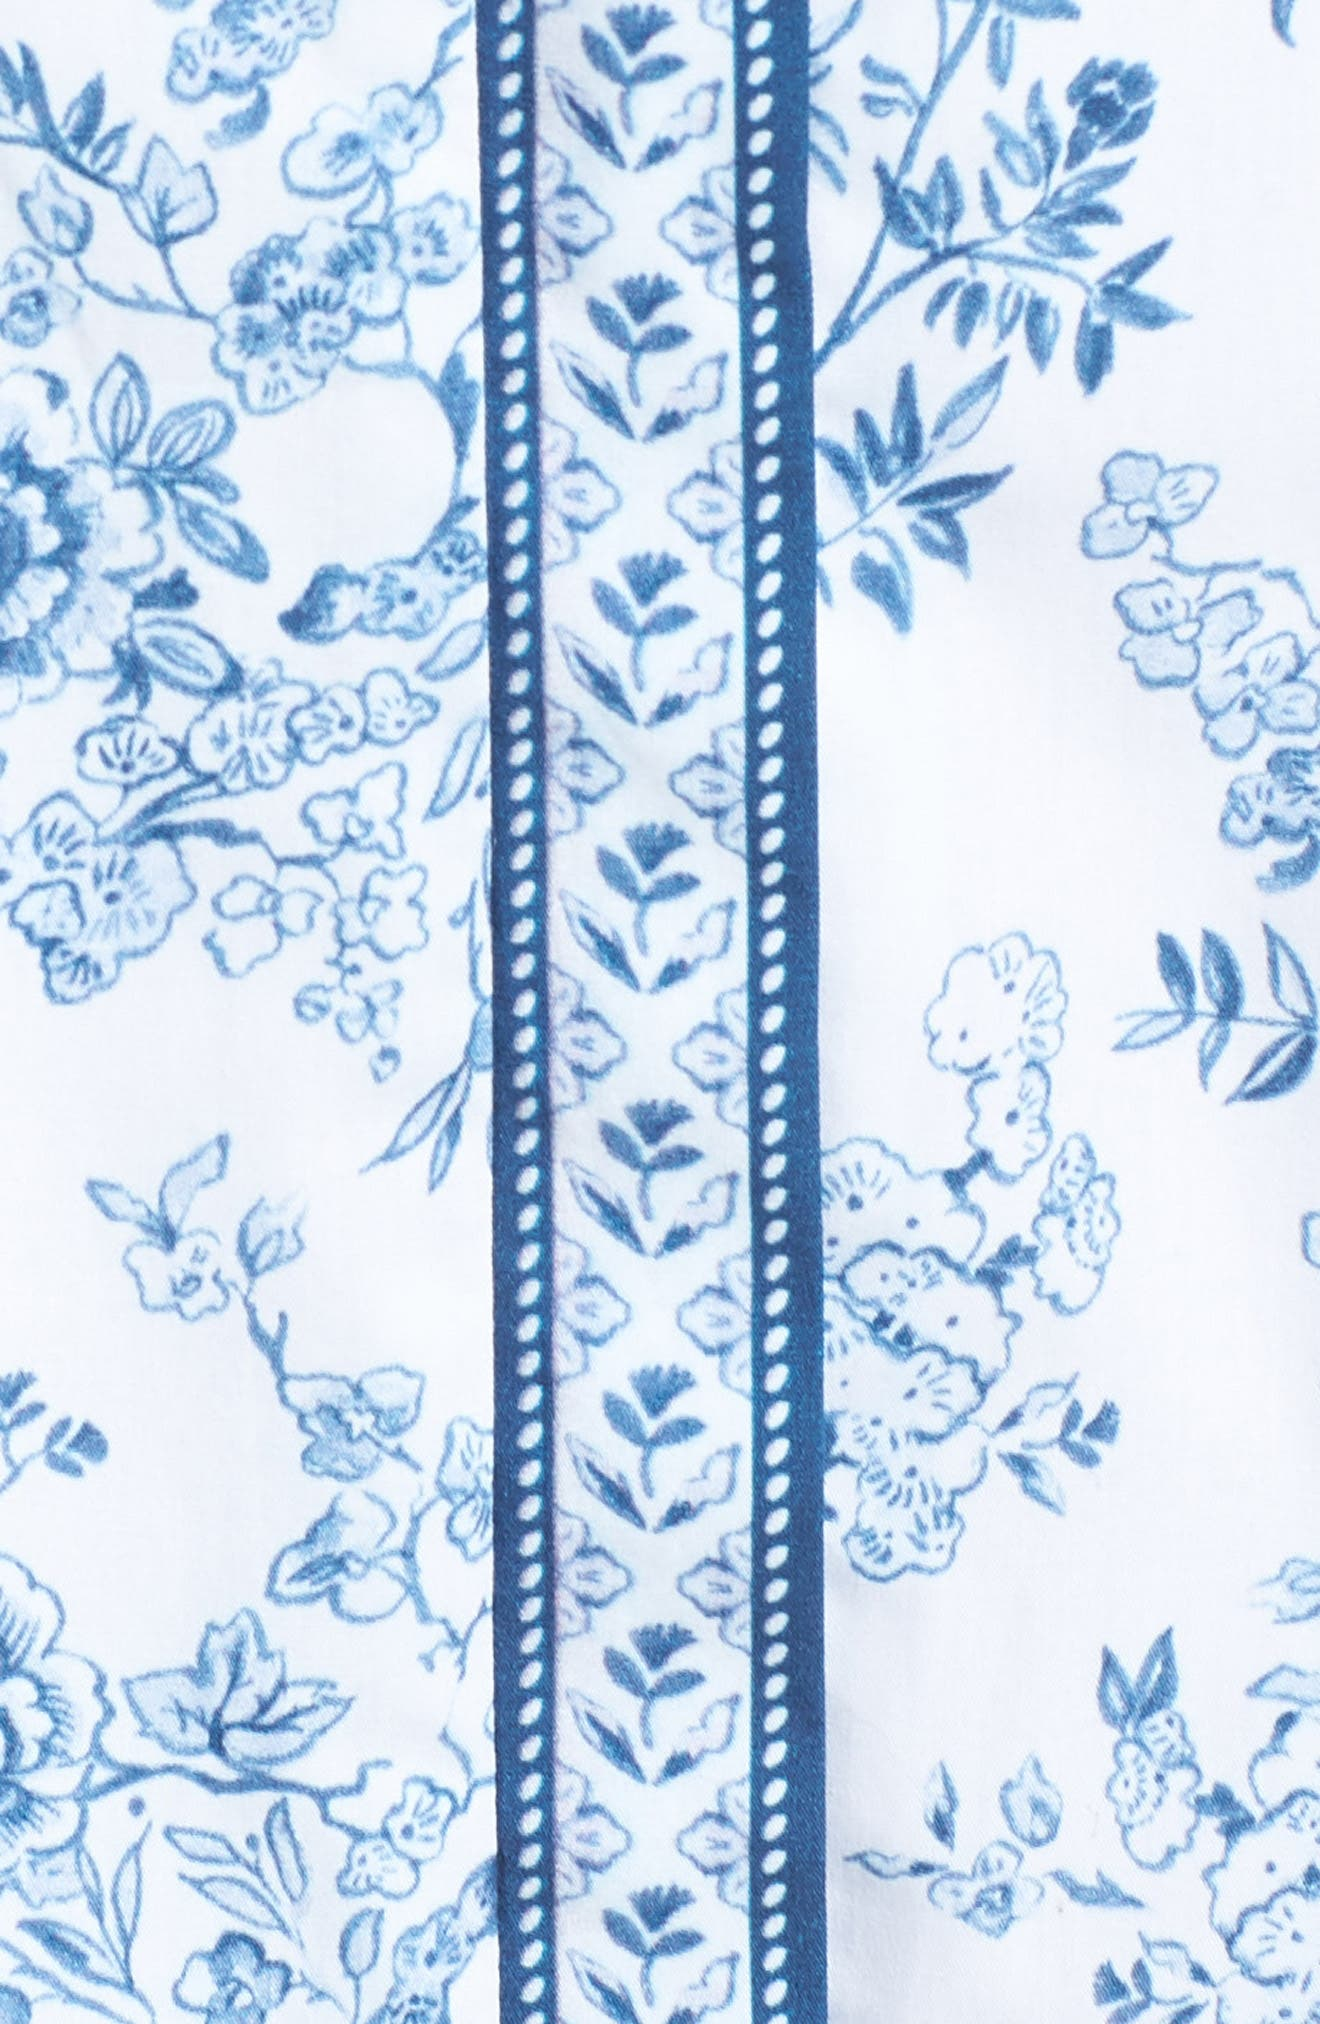 Darla Cotton Toile Shirtdress,                             Alternate thumbnail 7, color,                             Cloud/ Cornflower